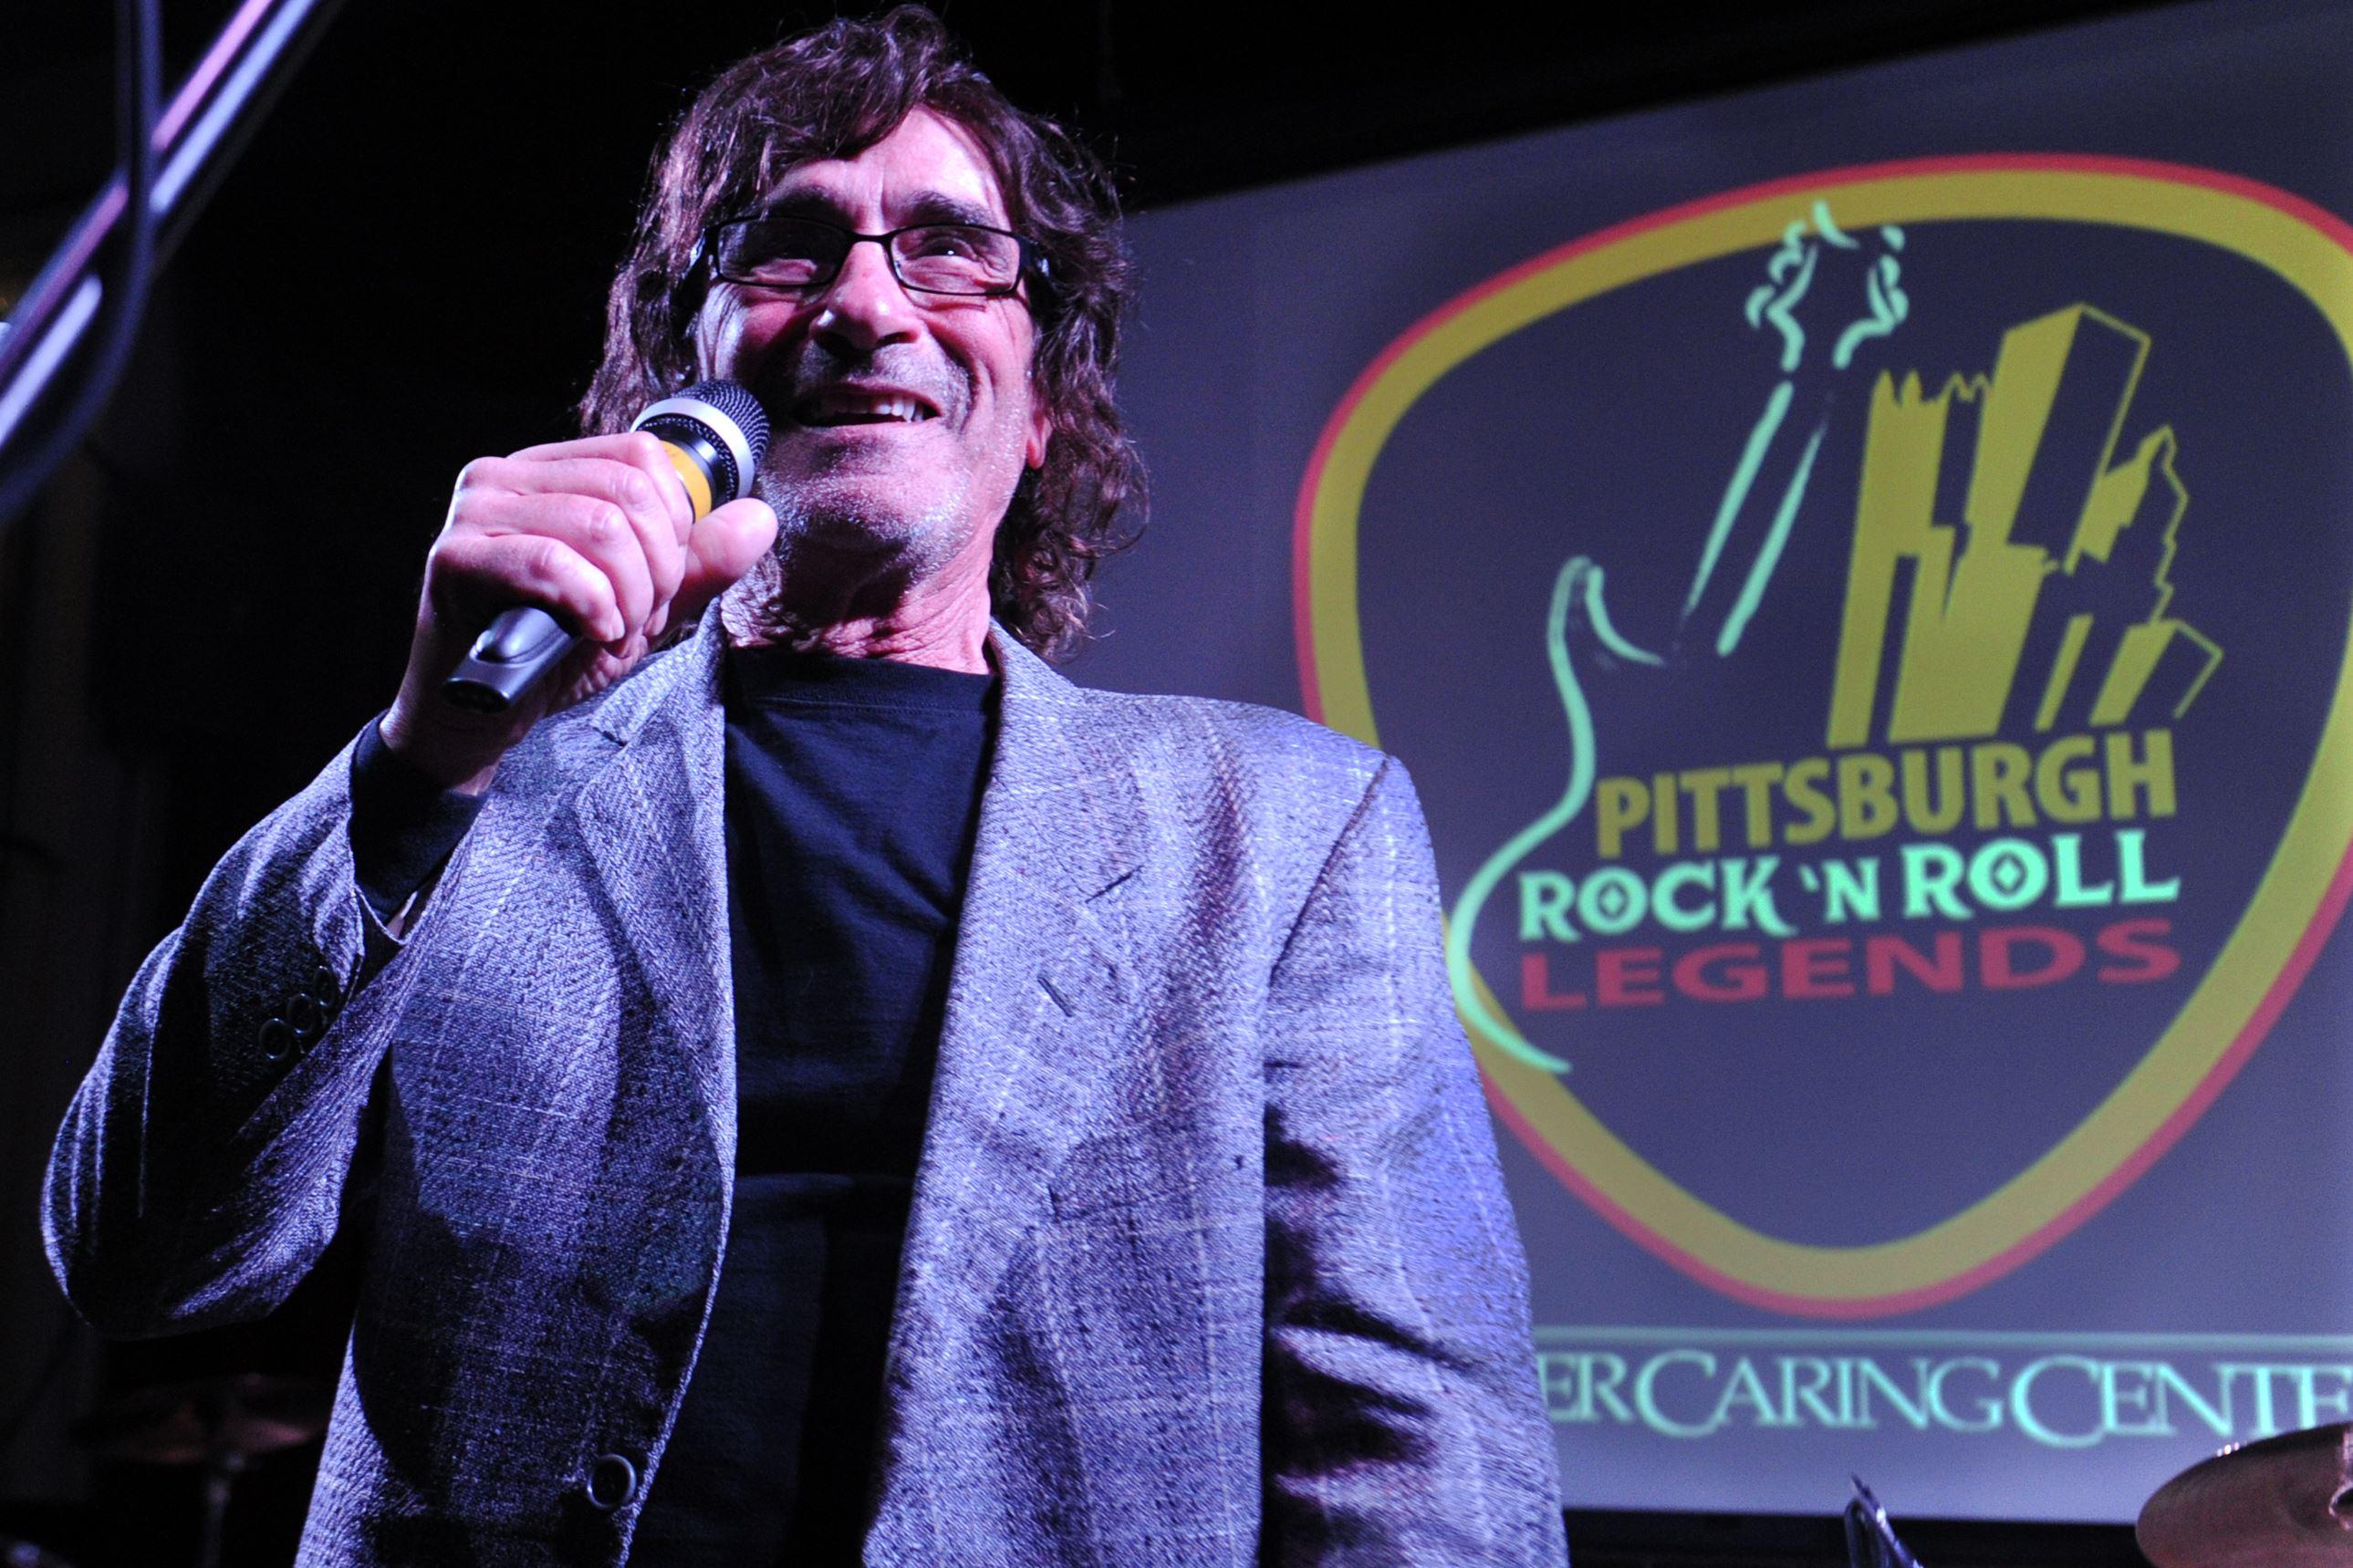 Donnie Iris, Pittsburgh Rock 'n Roll Legends